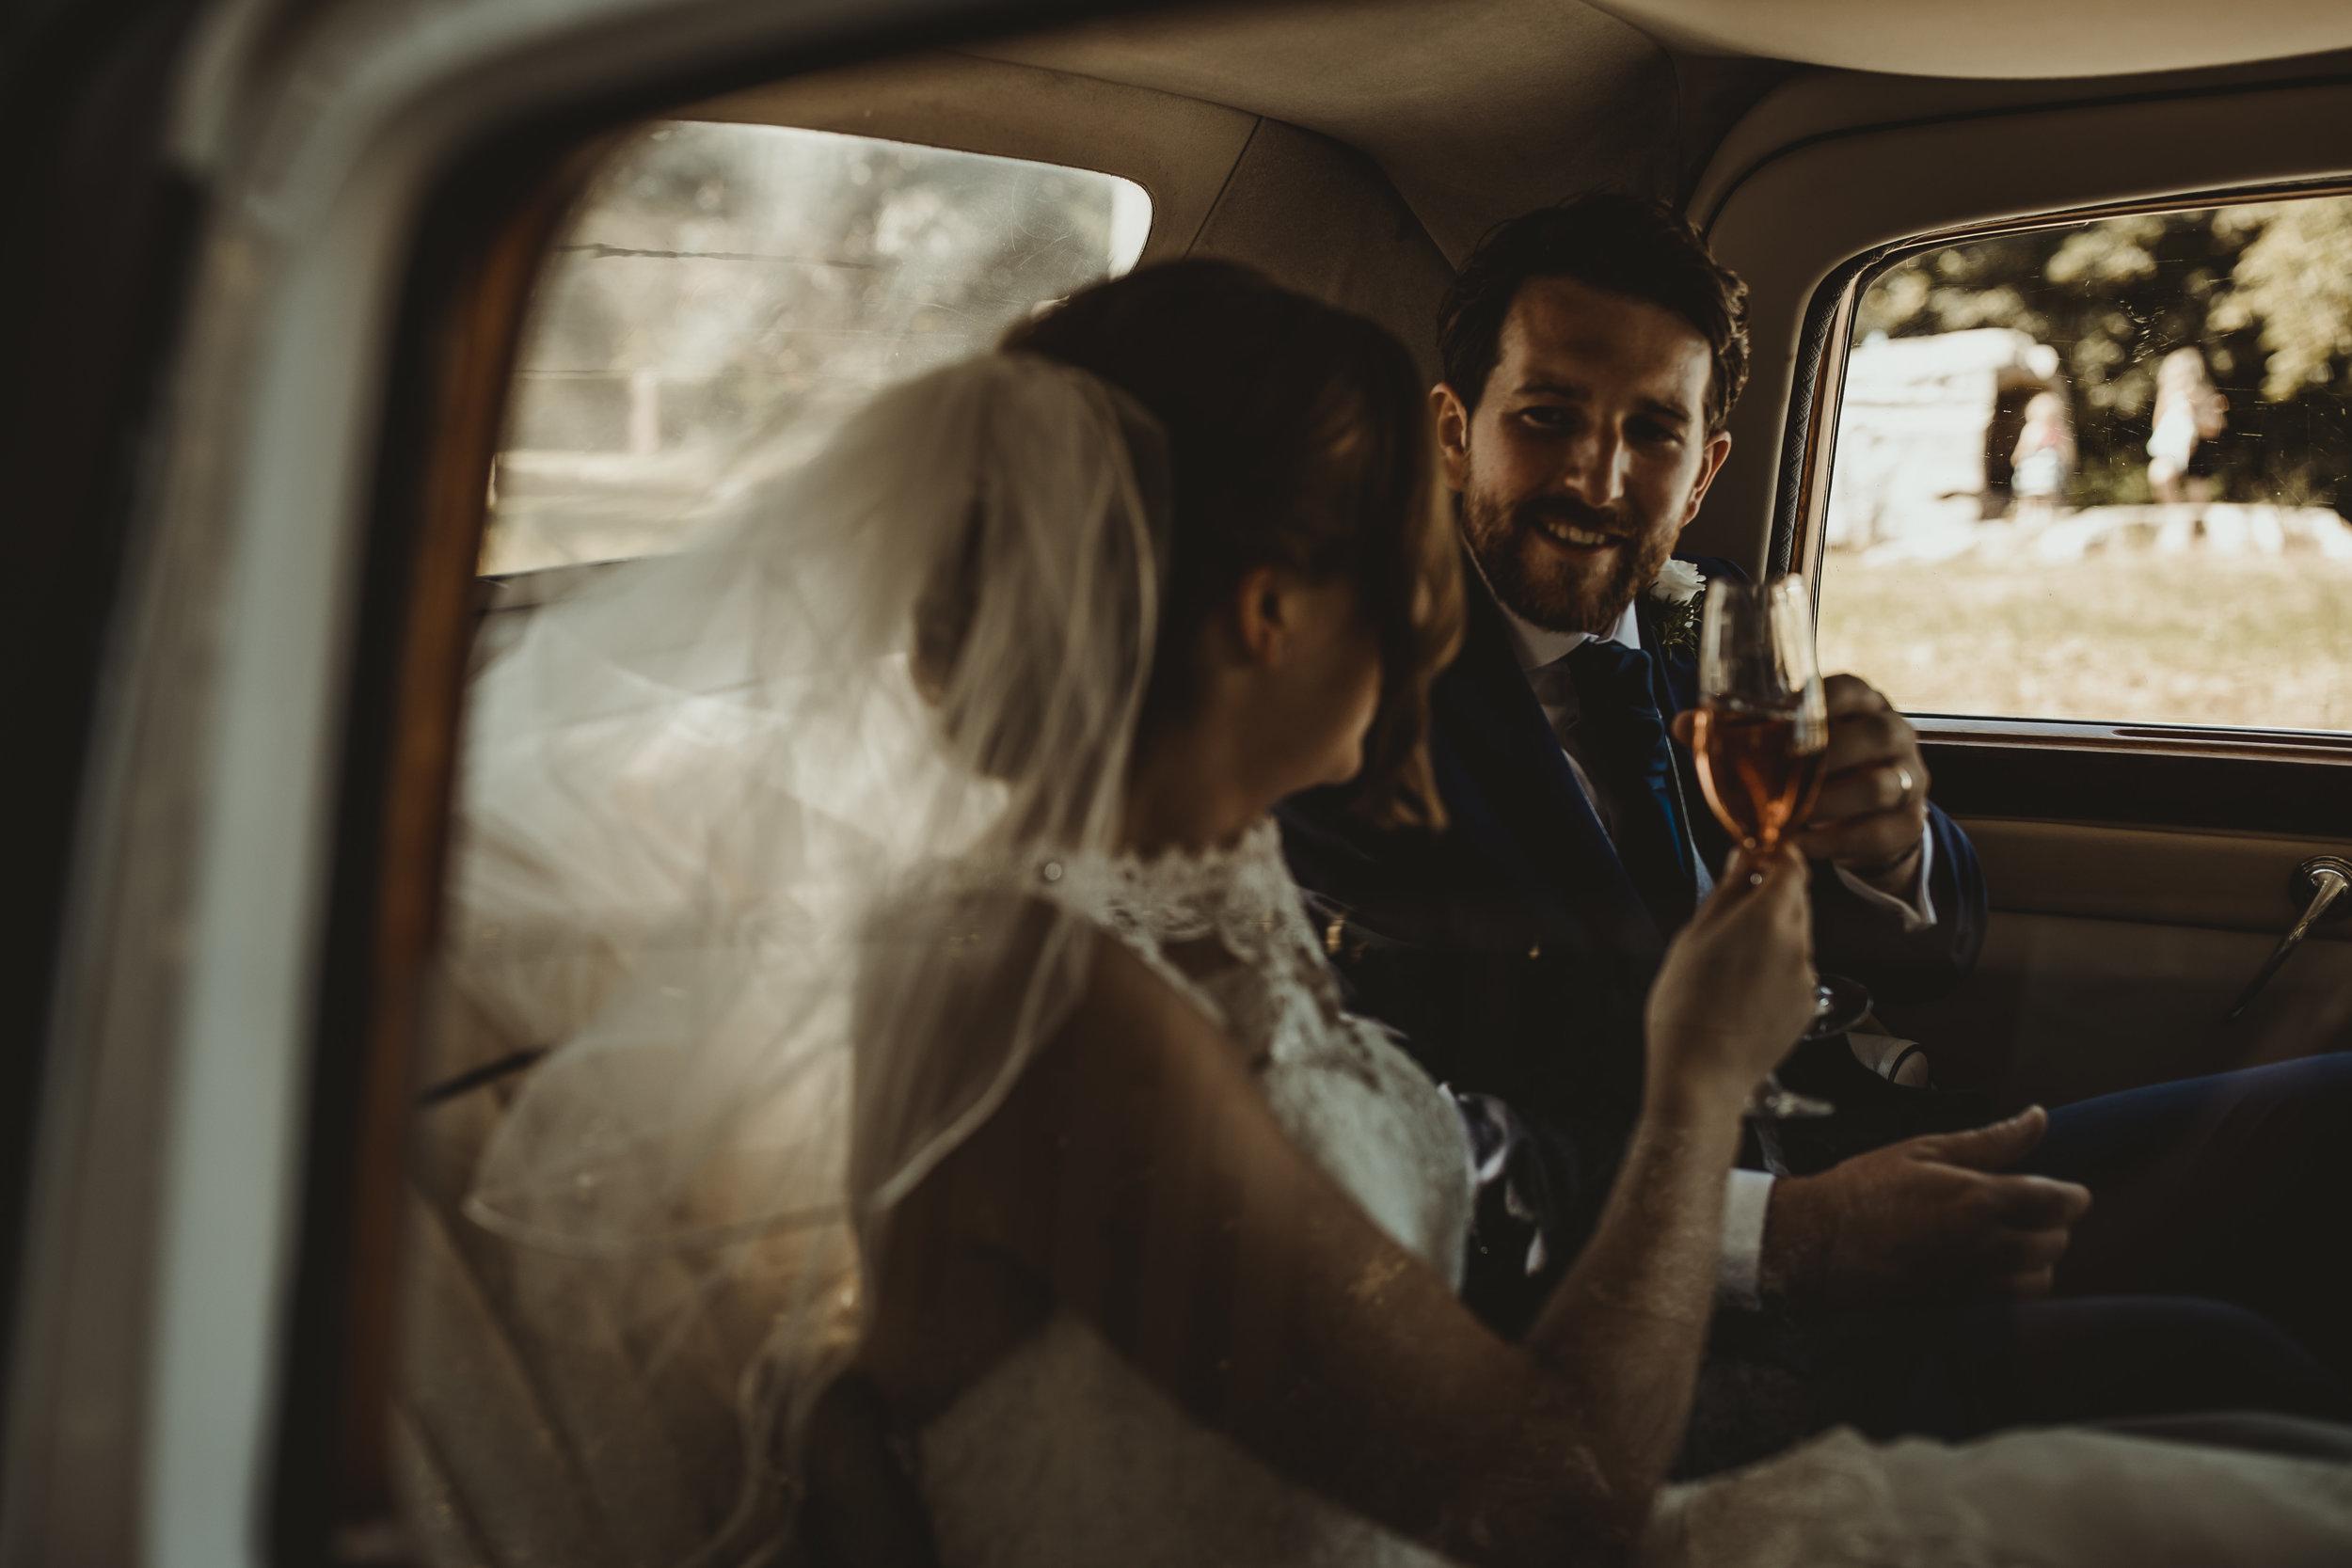 C&S_SURREY_WEDDING_PHOTOGRAPHY_LONDON_HARROGATE_YORSHIRE-506.JPG